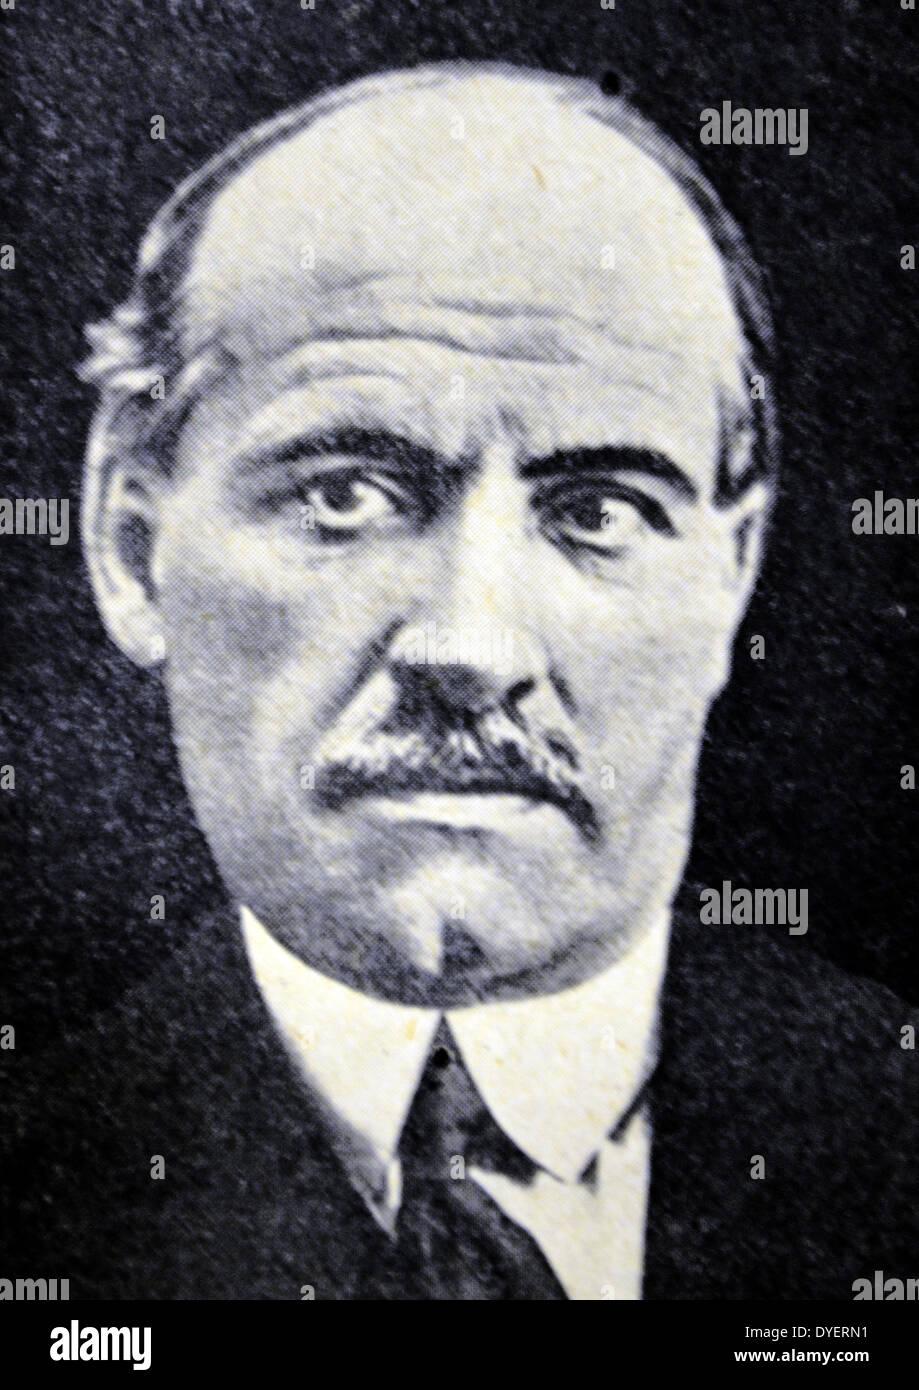 Spanish Civil War Don Jose Ortega Y Gasset Stock Photo